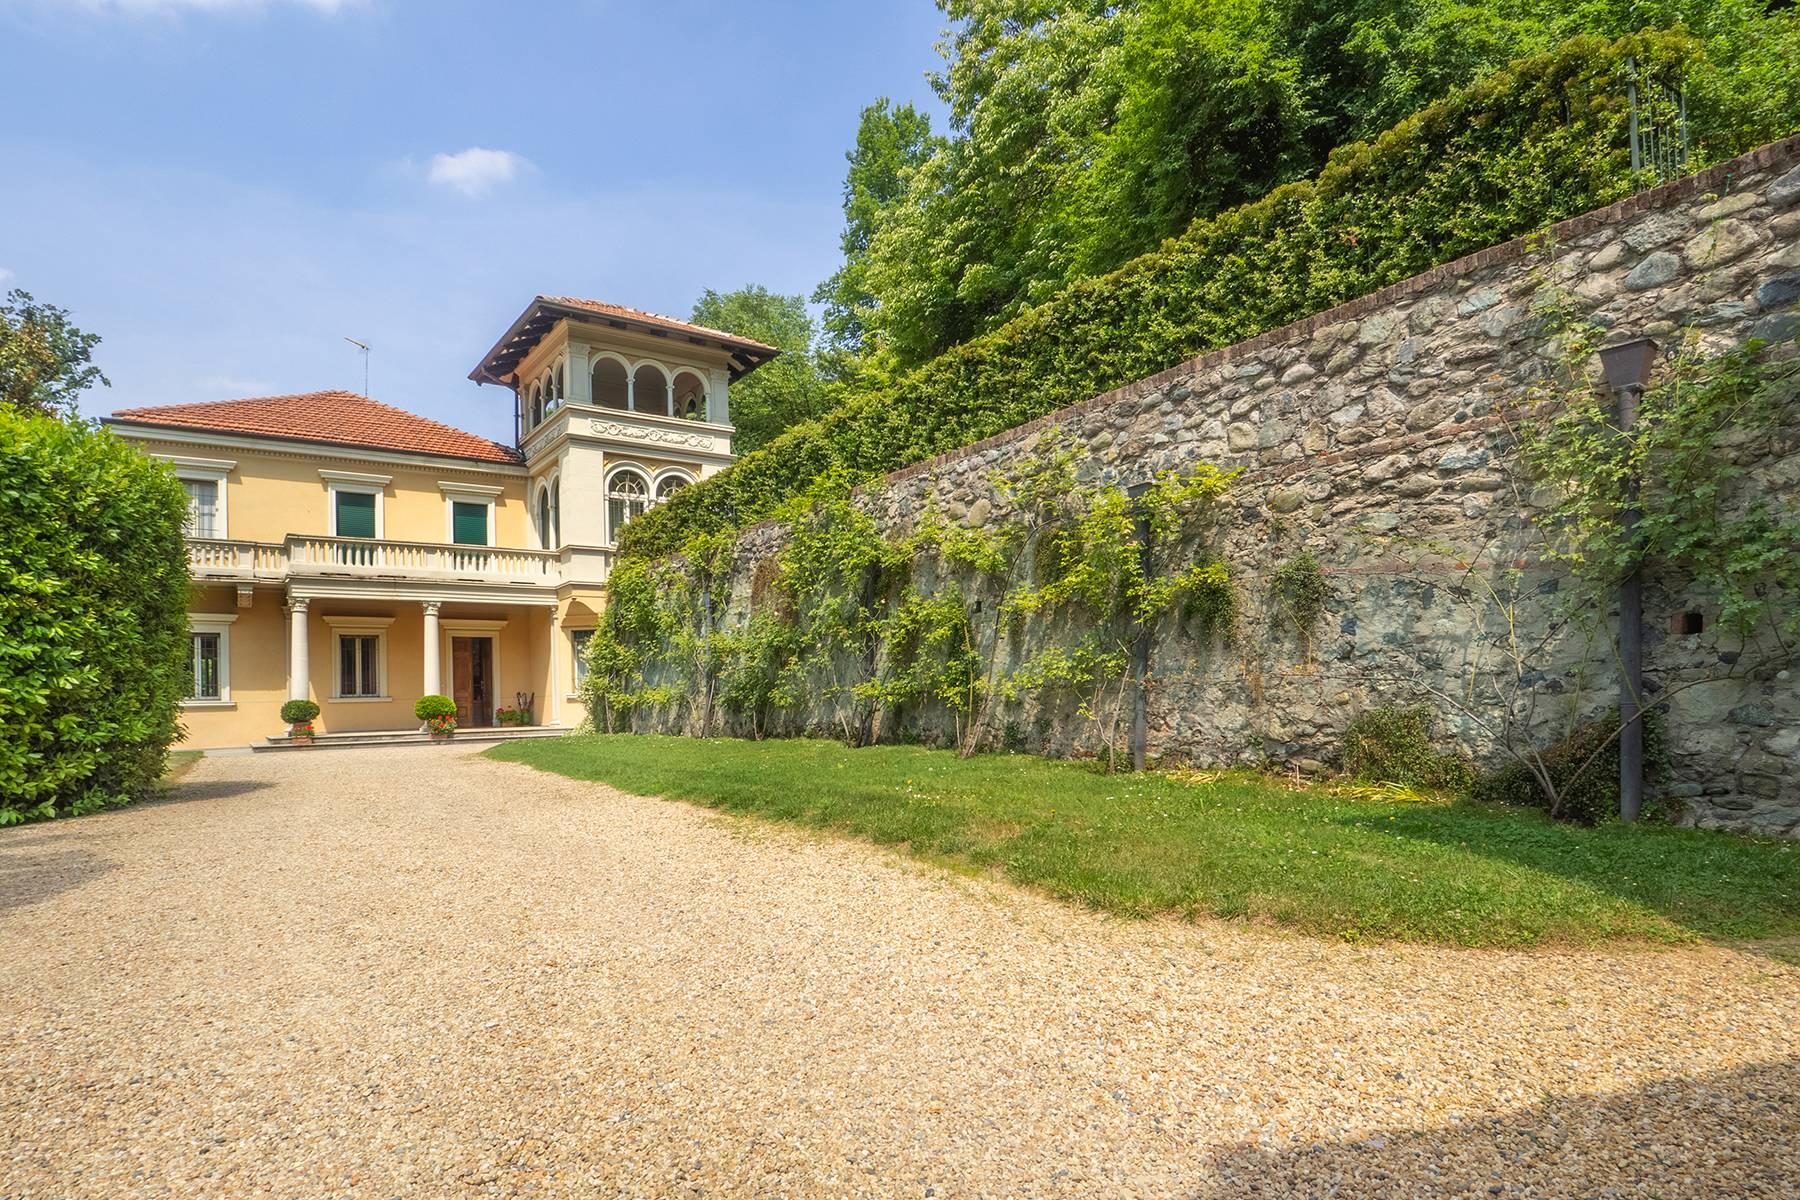 Casa indipendente in Vendita a Torino: 5 locali, 657 mq - Foto 2